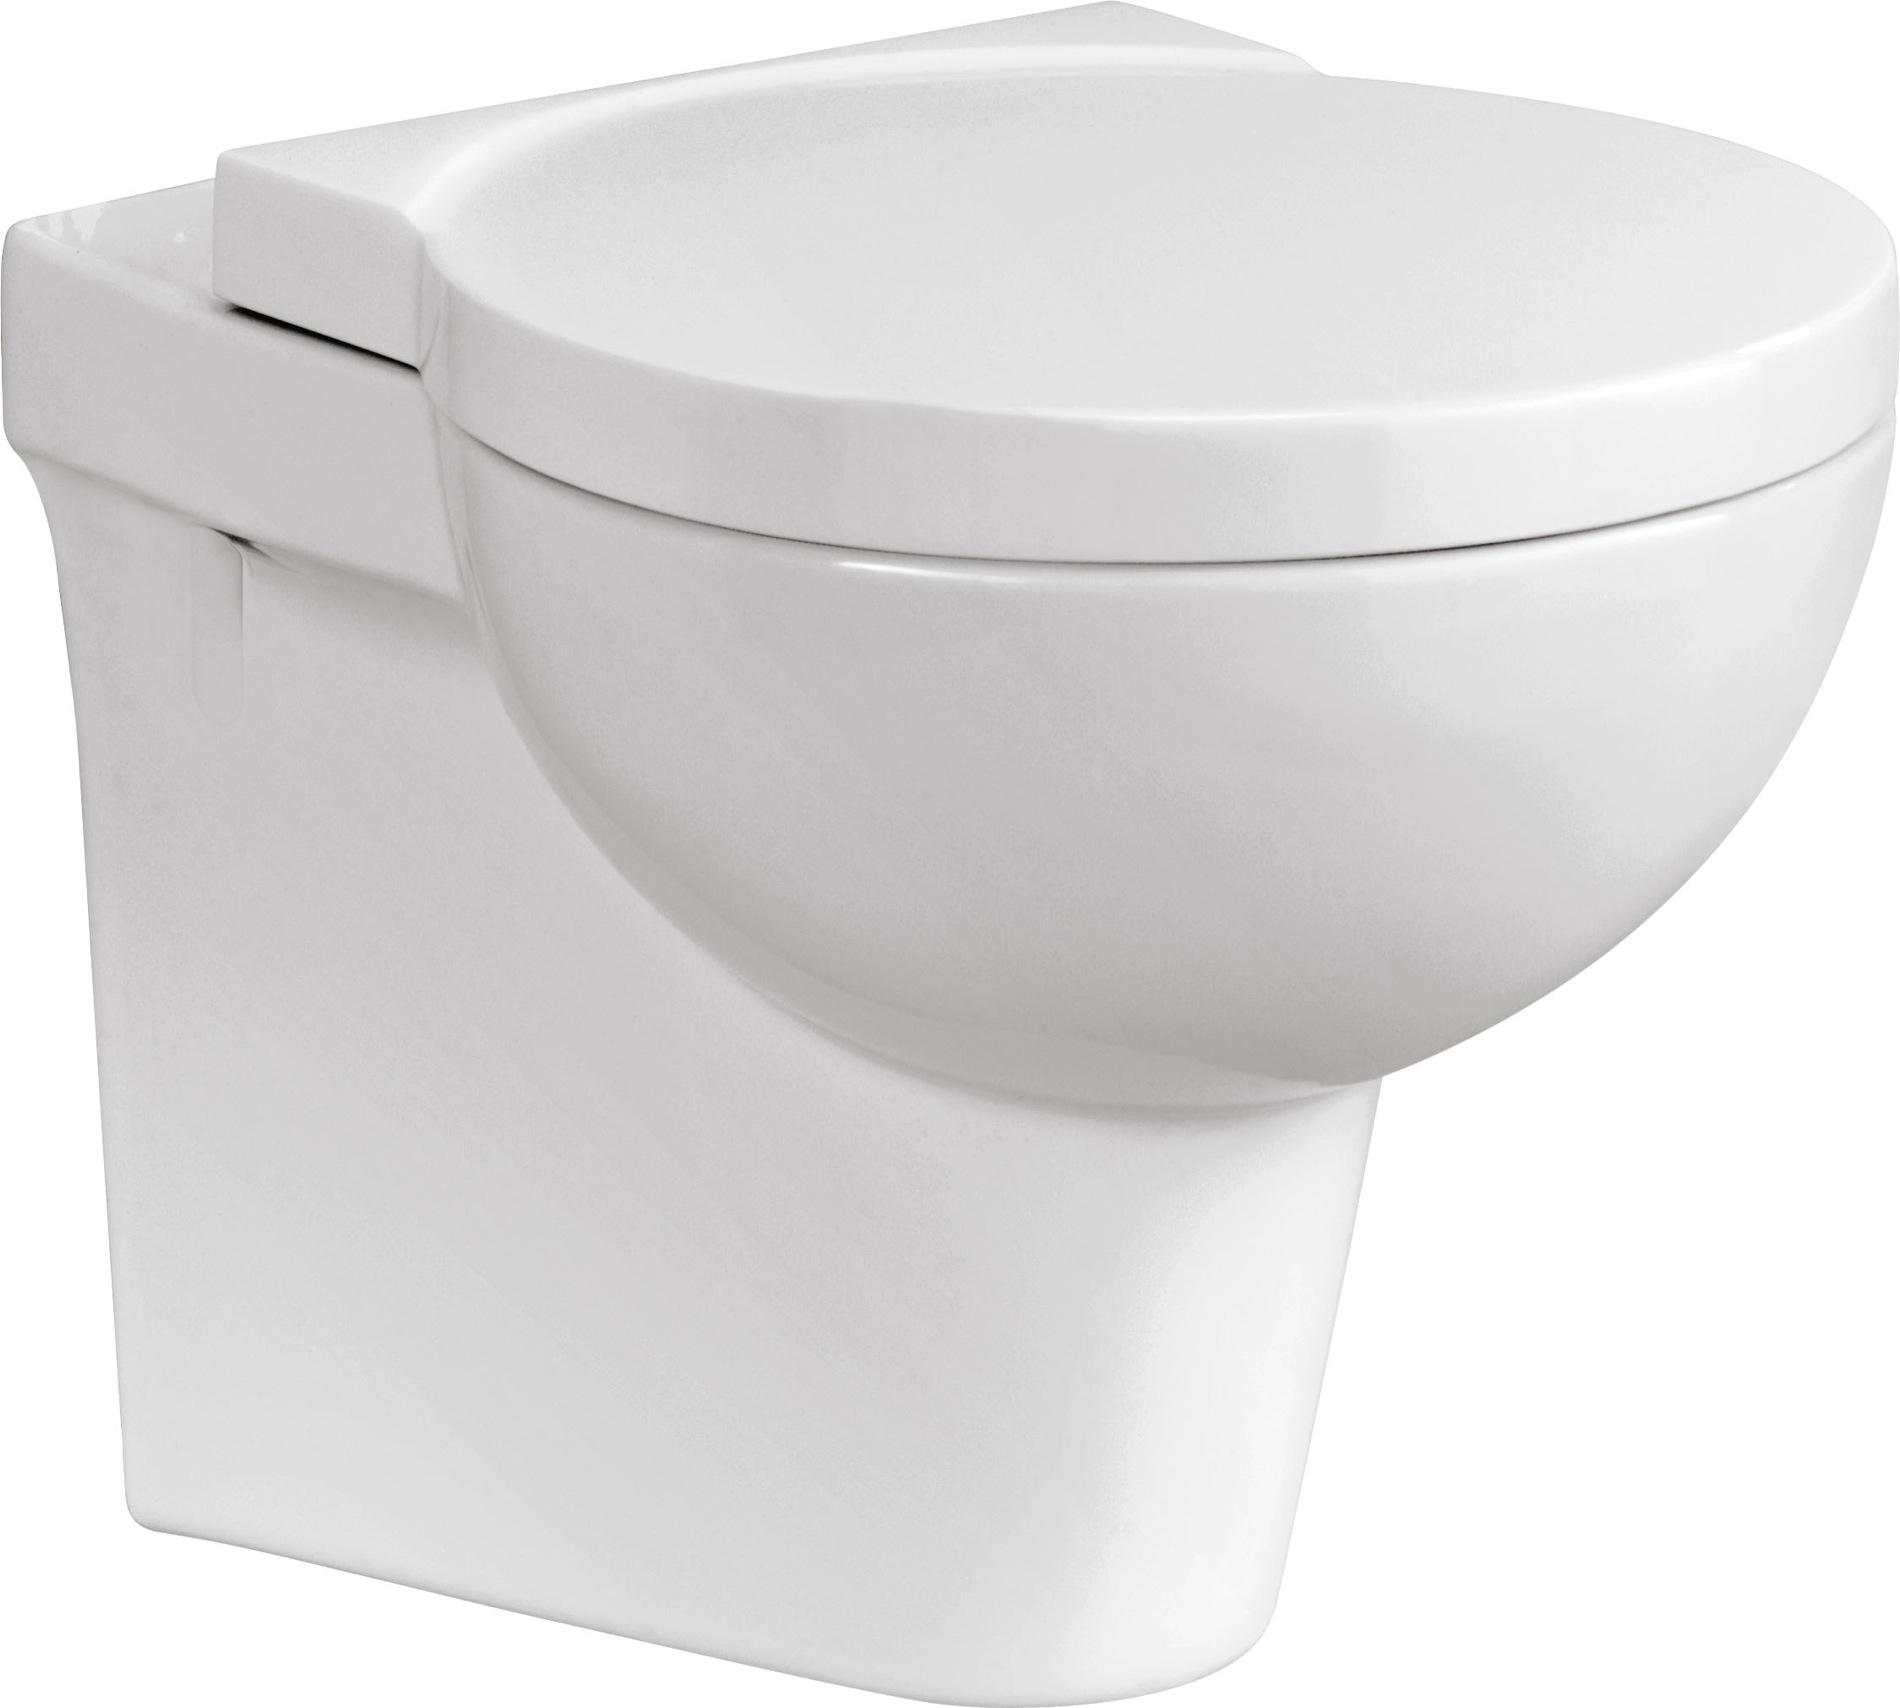 wc wand toilette hängend wandhängend oval tiefspüler keramik sitz